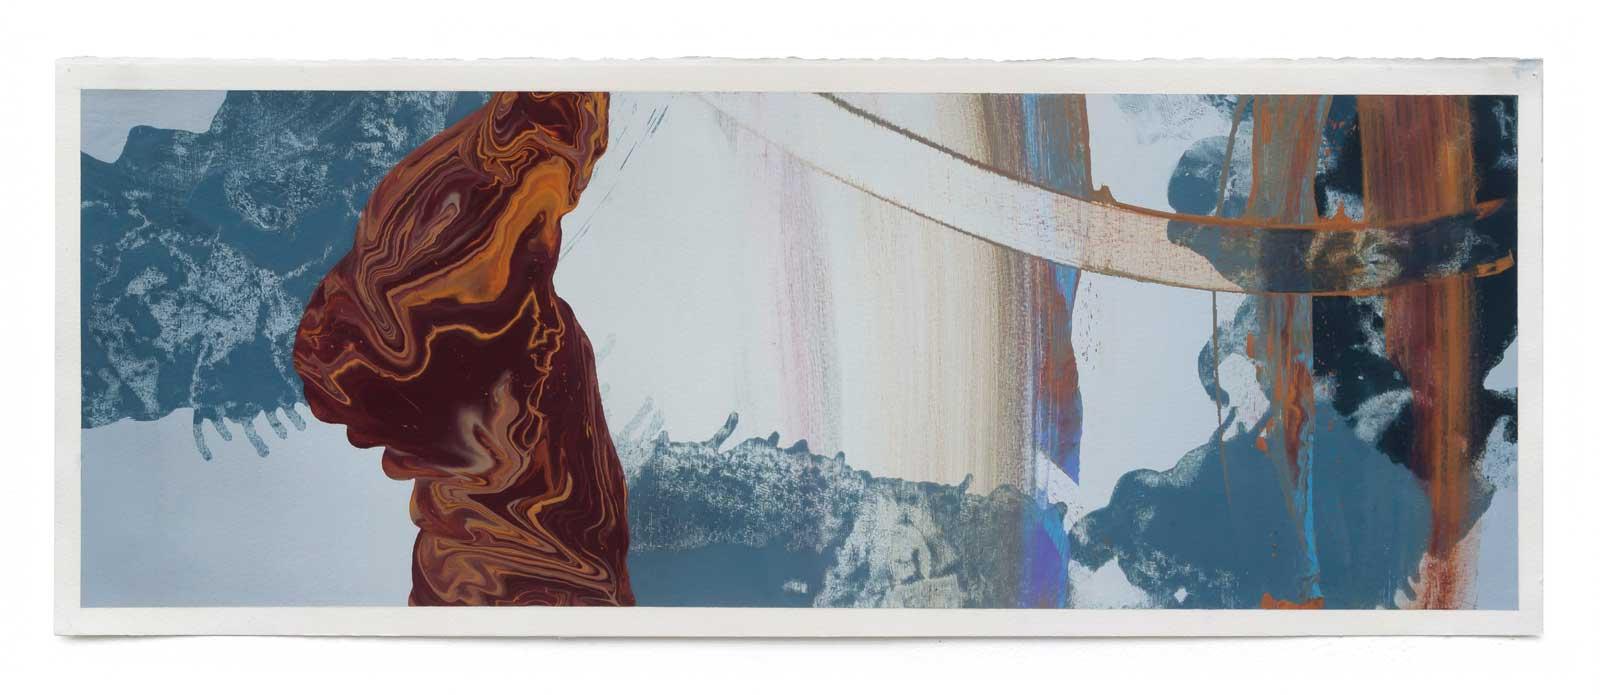 Disruptions-5-oil-on-paper-25.4 cm x 71.12 cm.